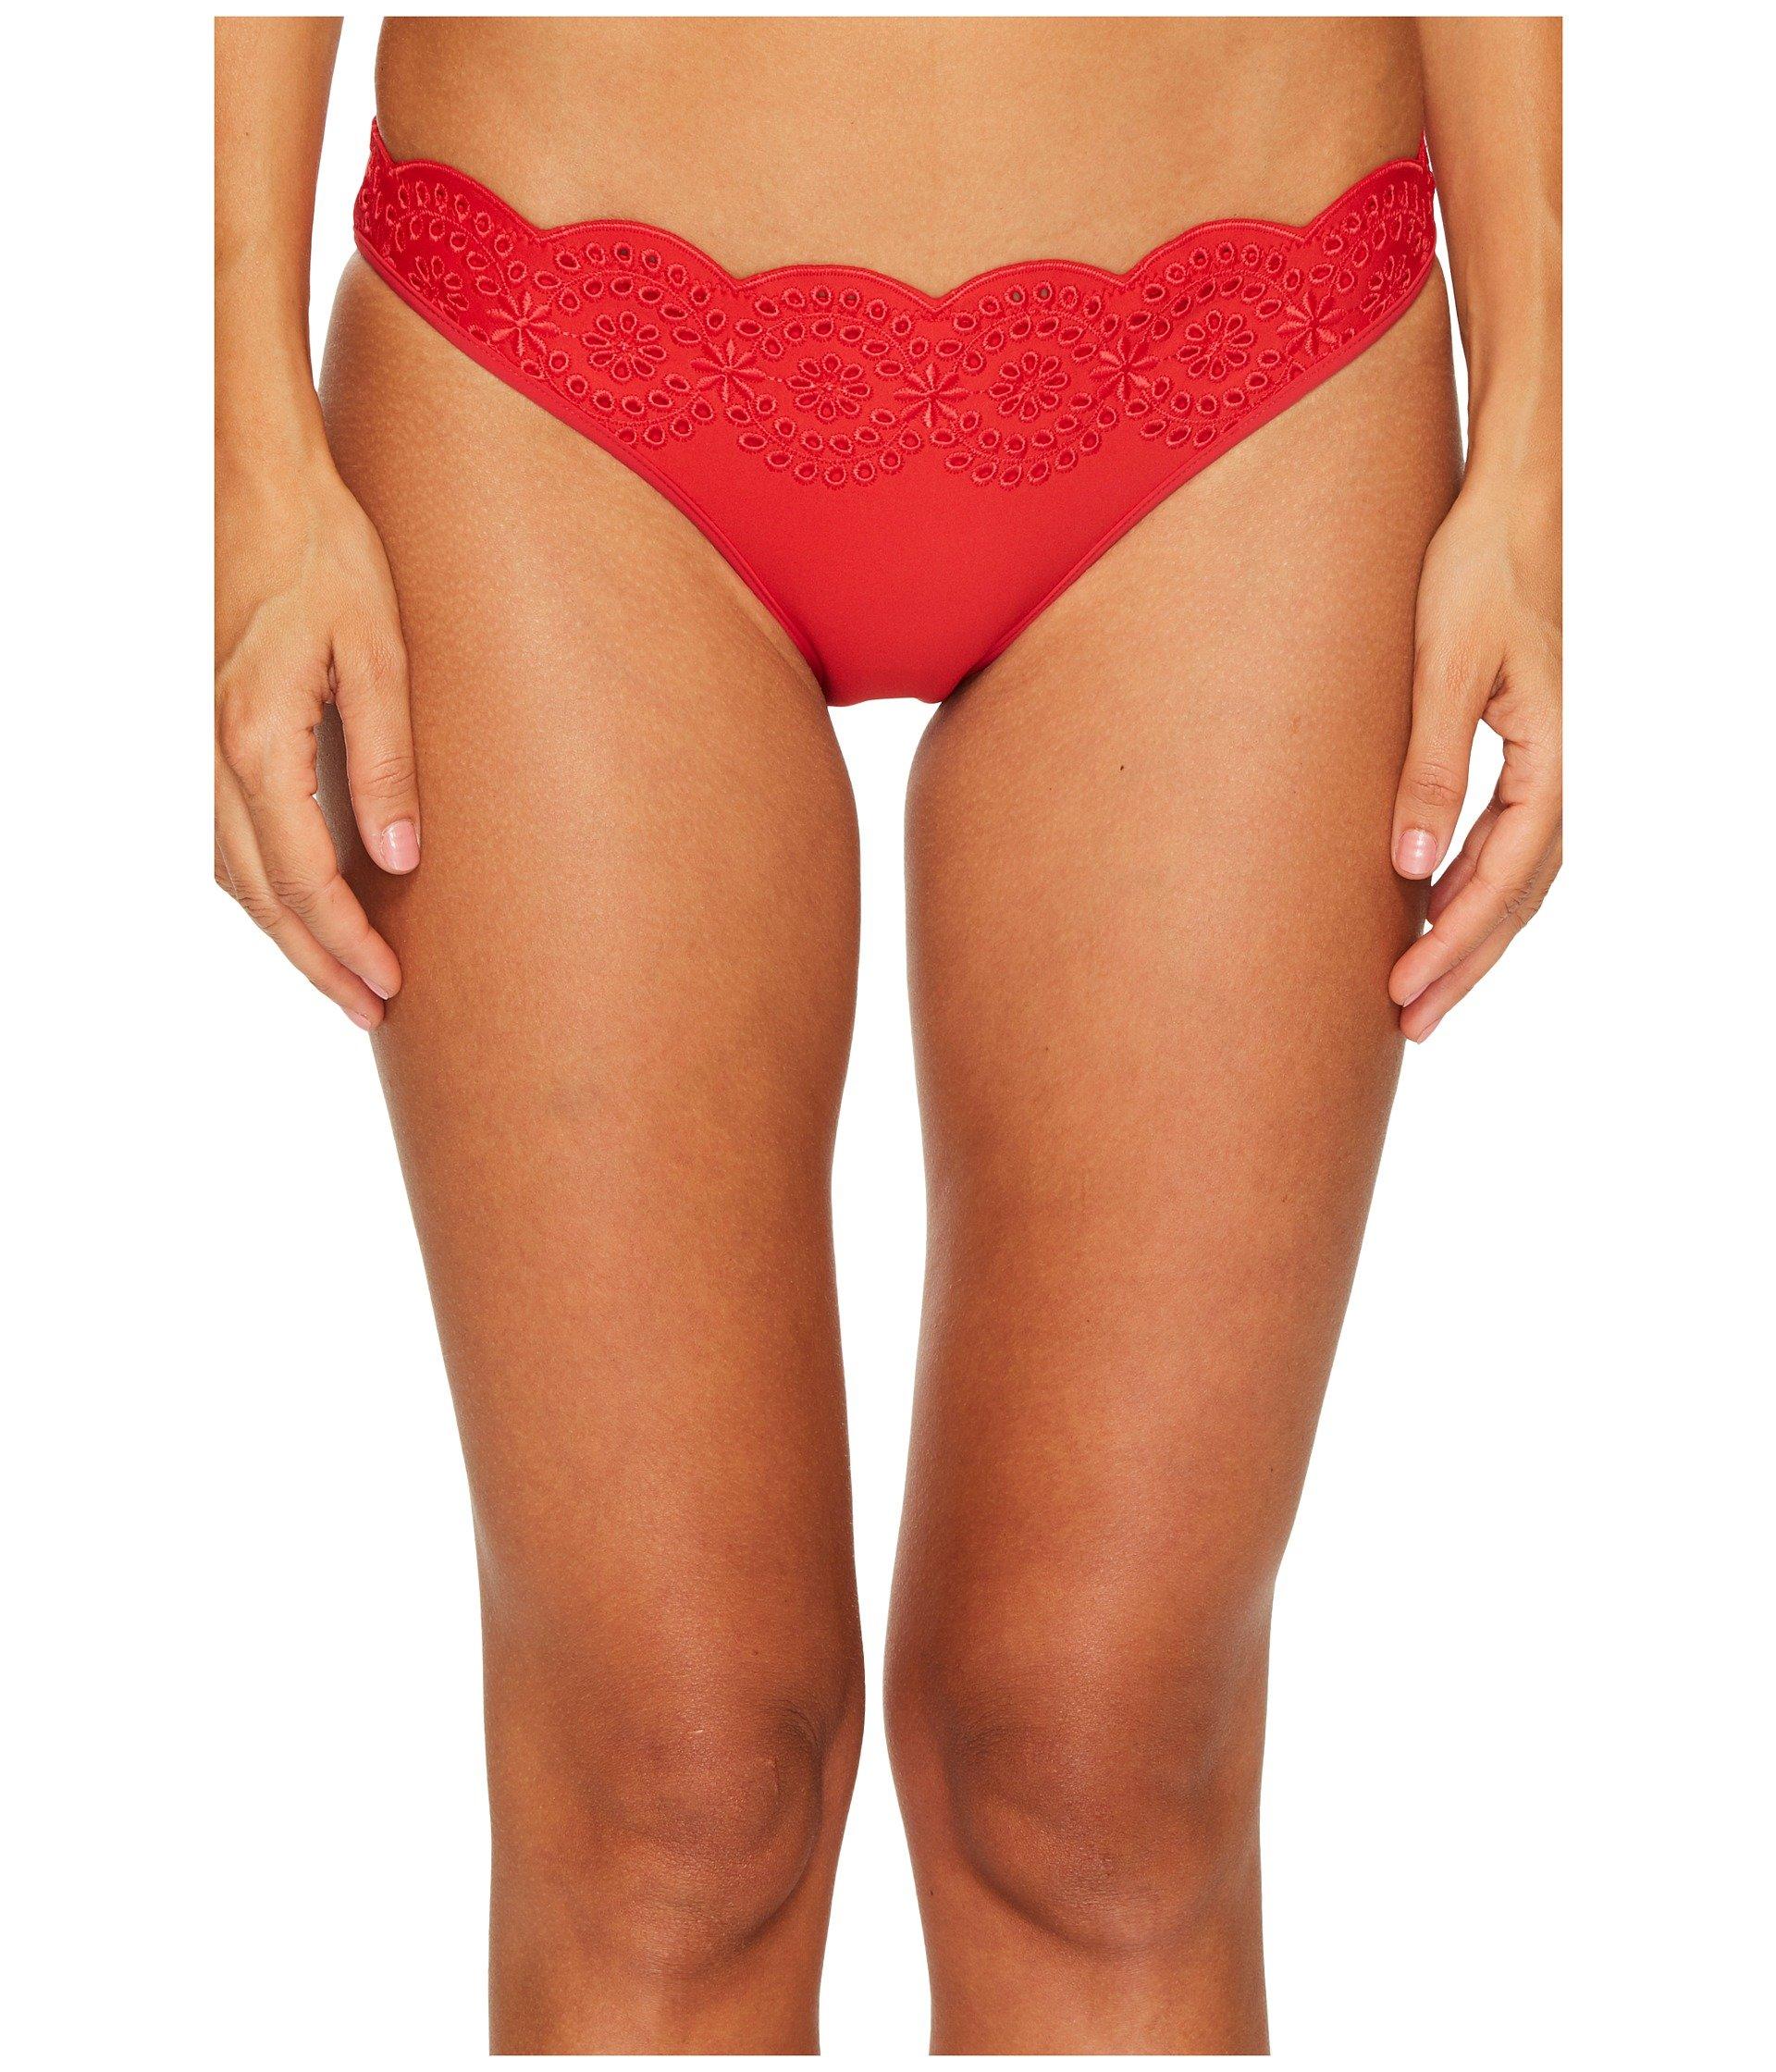 Broderie Anglaise Classic Bikini Bottom - Tango red Stella McCartney Best Wholesale lFIW92J